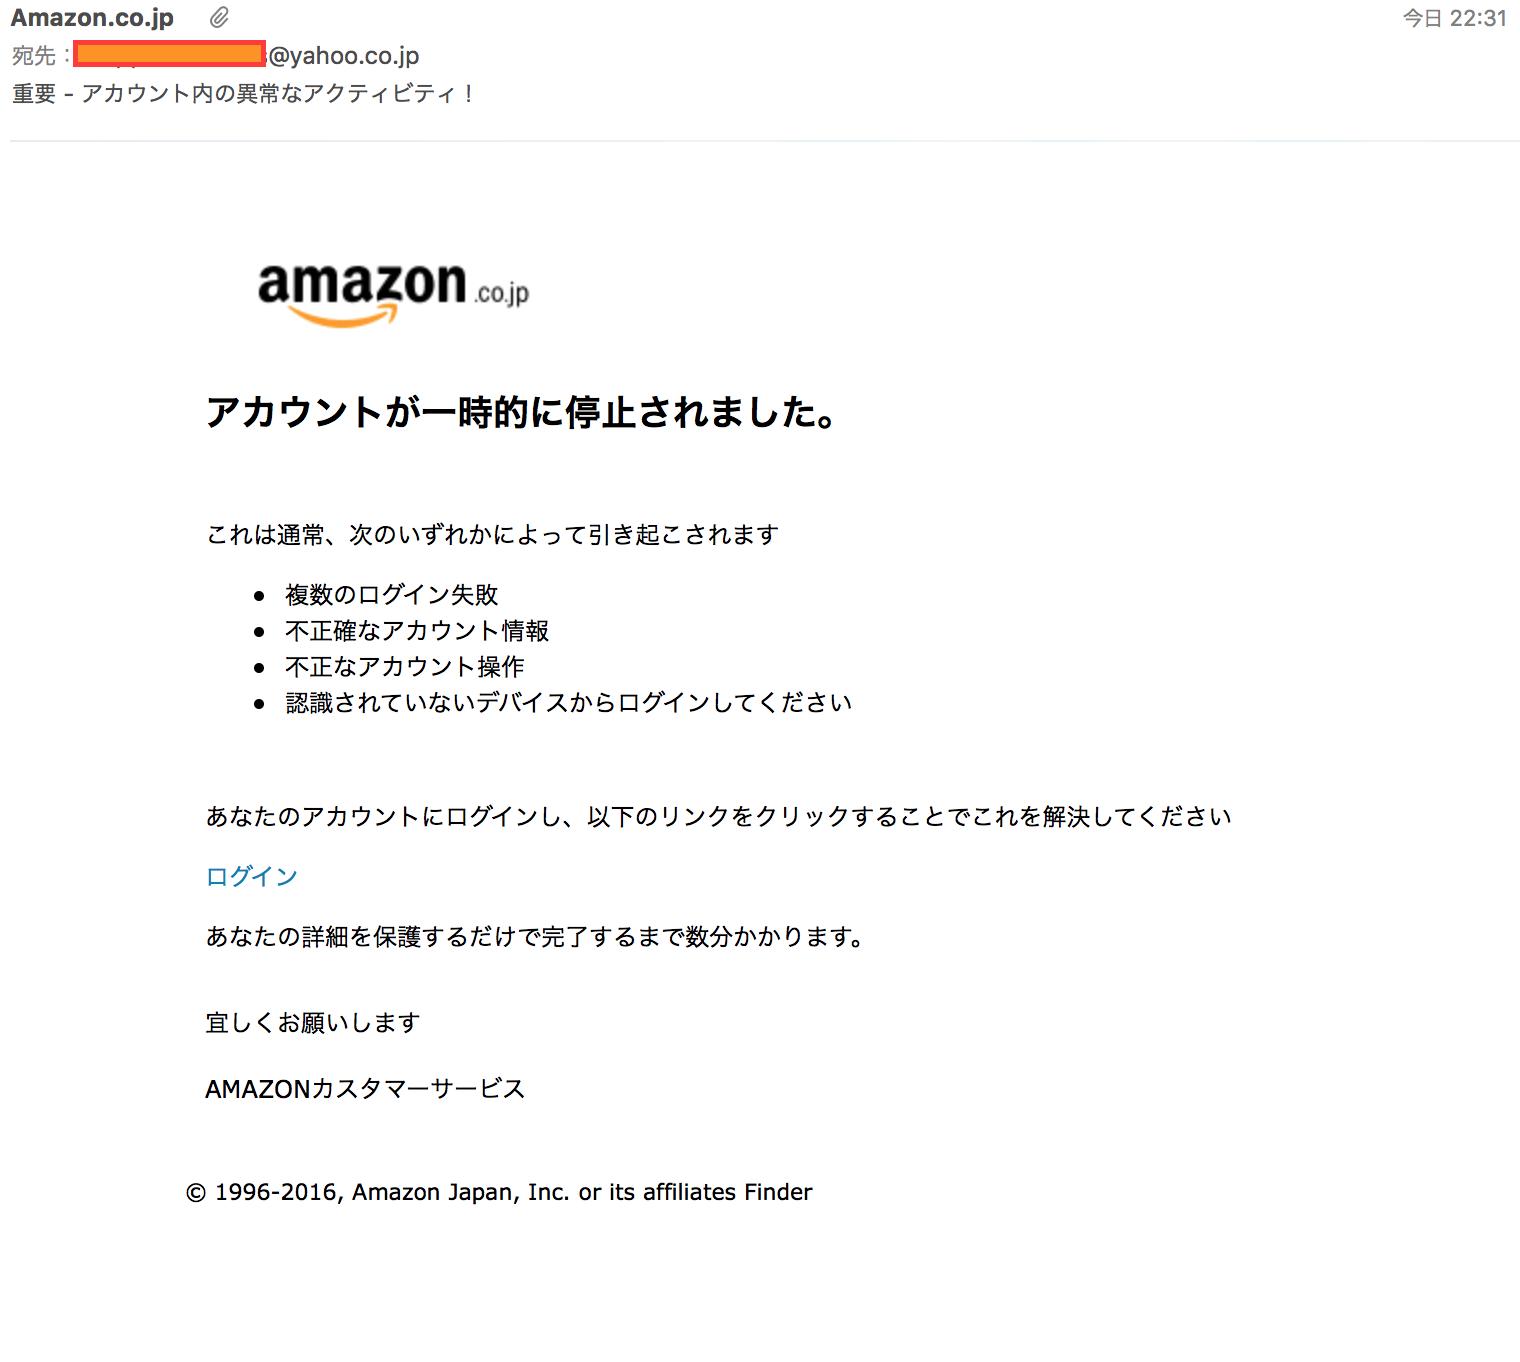 Amazonに見せかけた詐欺が流行っています。